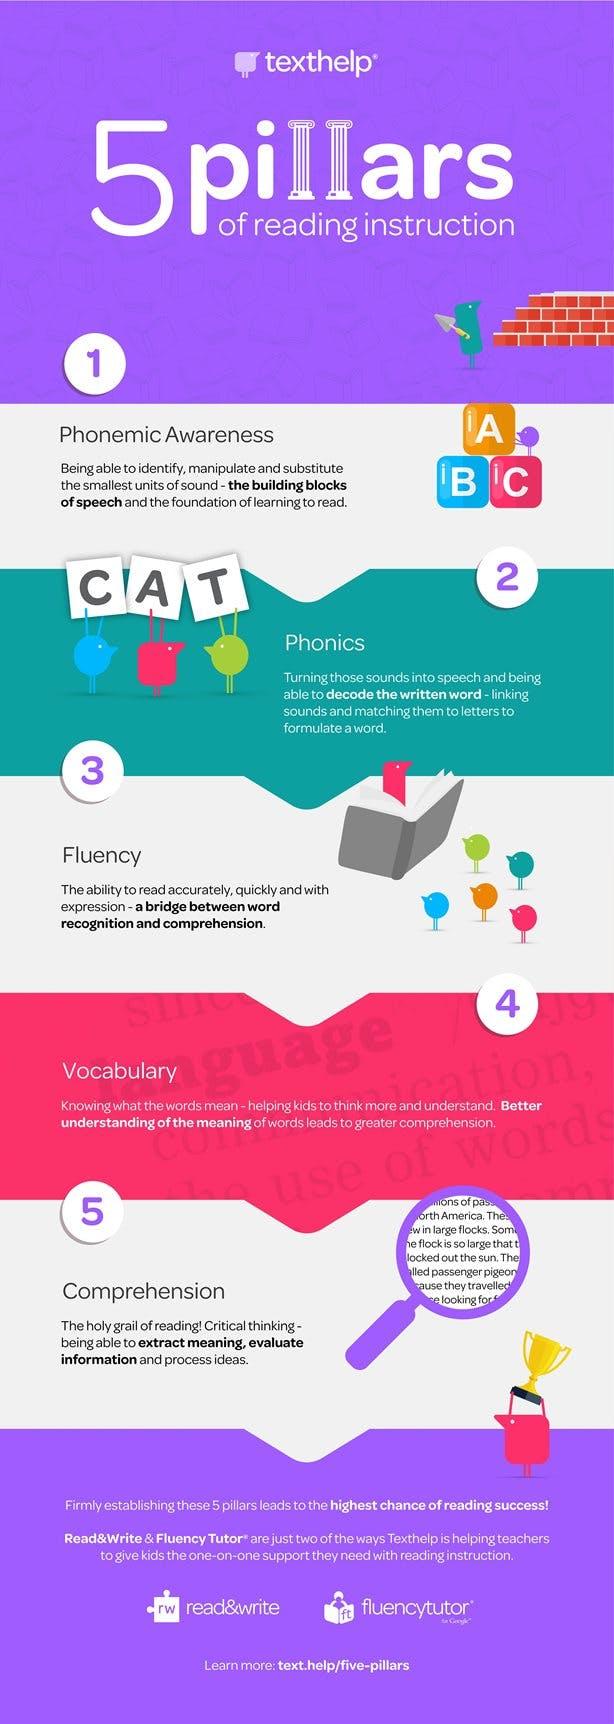 5 pillars of reading instruction infographic